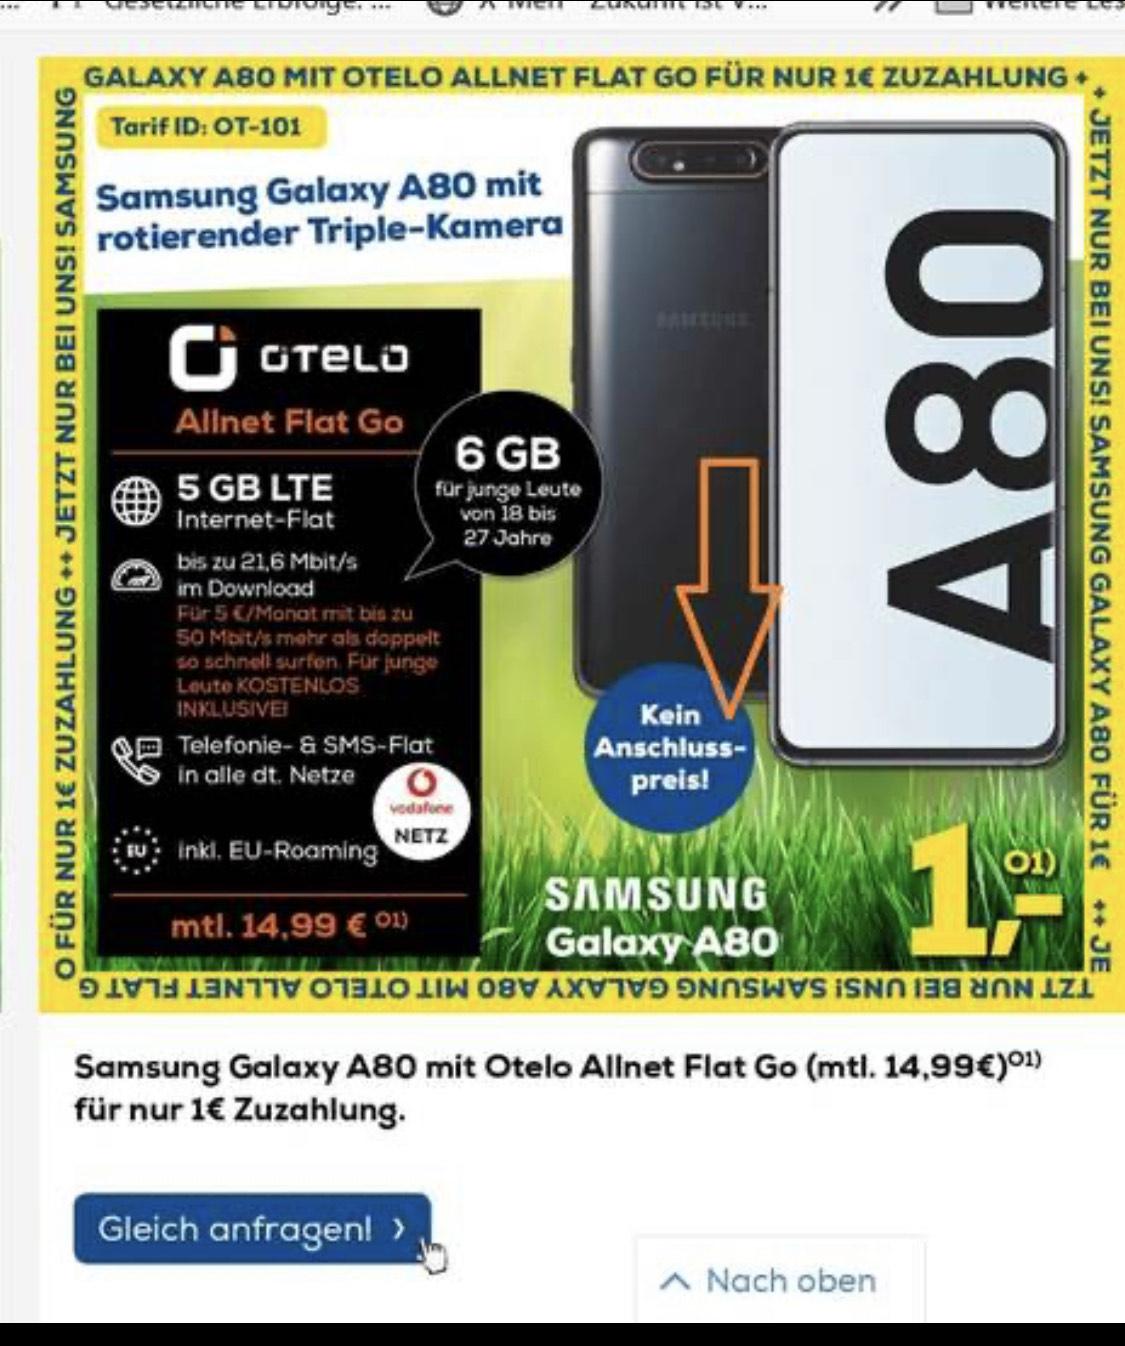 [OTELO] Samsung Galaxy A80 mit 5GB Internet + Allnet/SMS Flat & 21,6 Mbit LTE // Einmalig: 1€, Monatlich: 14,99€